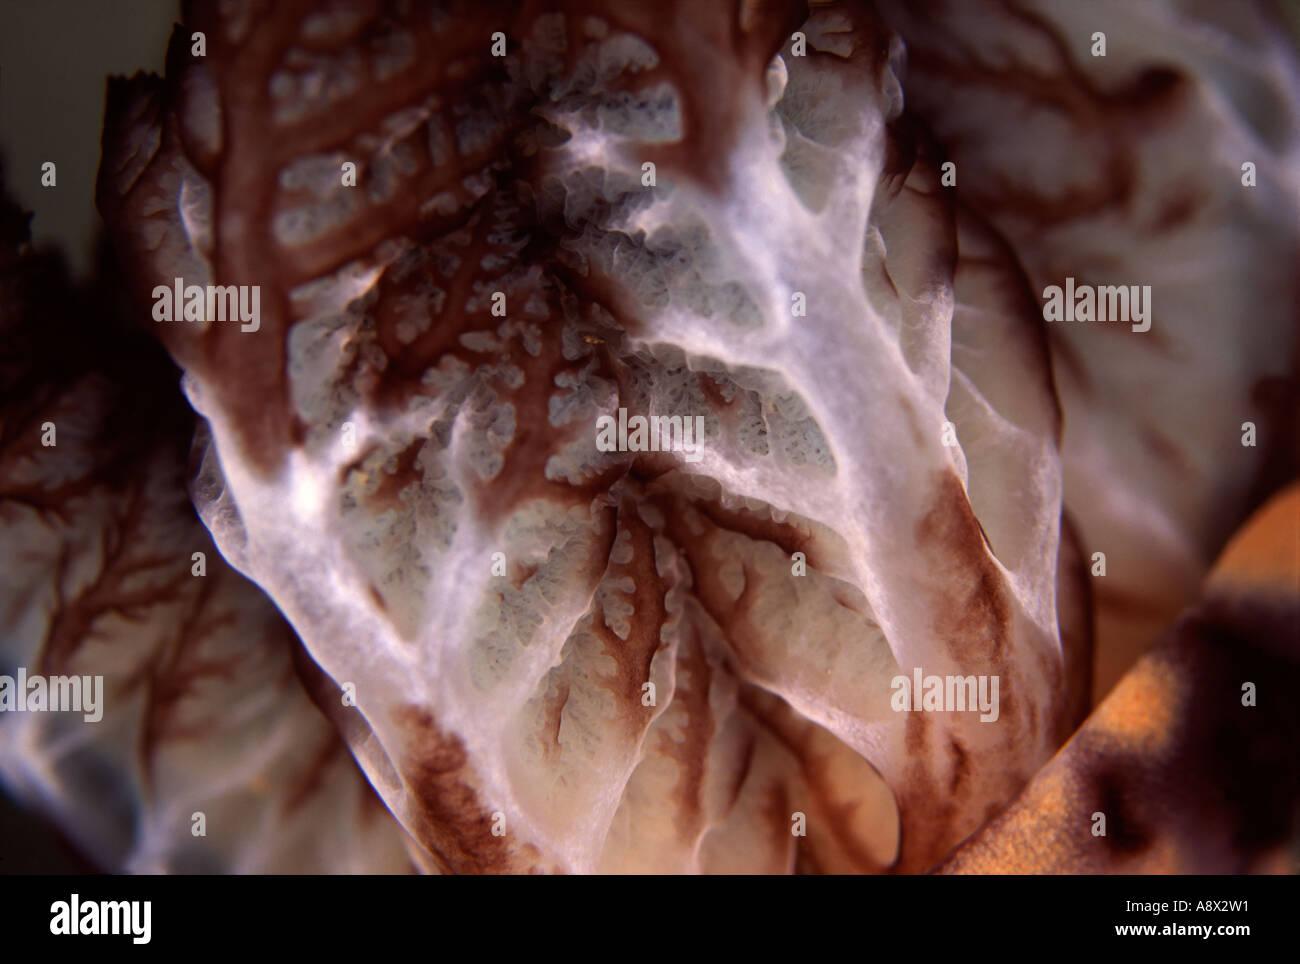 Kentrodoris rubescens Gills - Stock Image